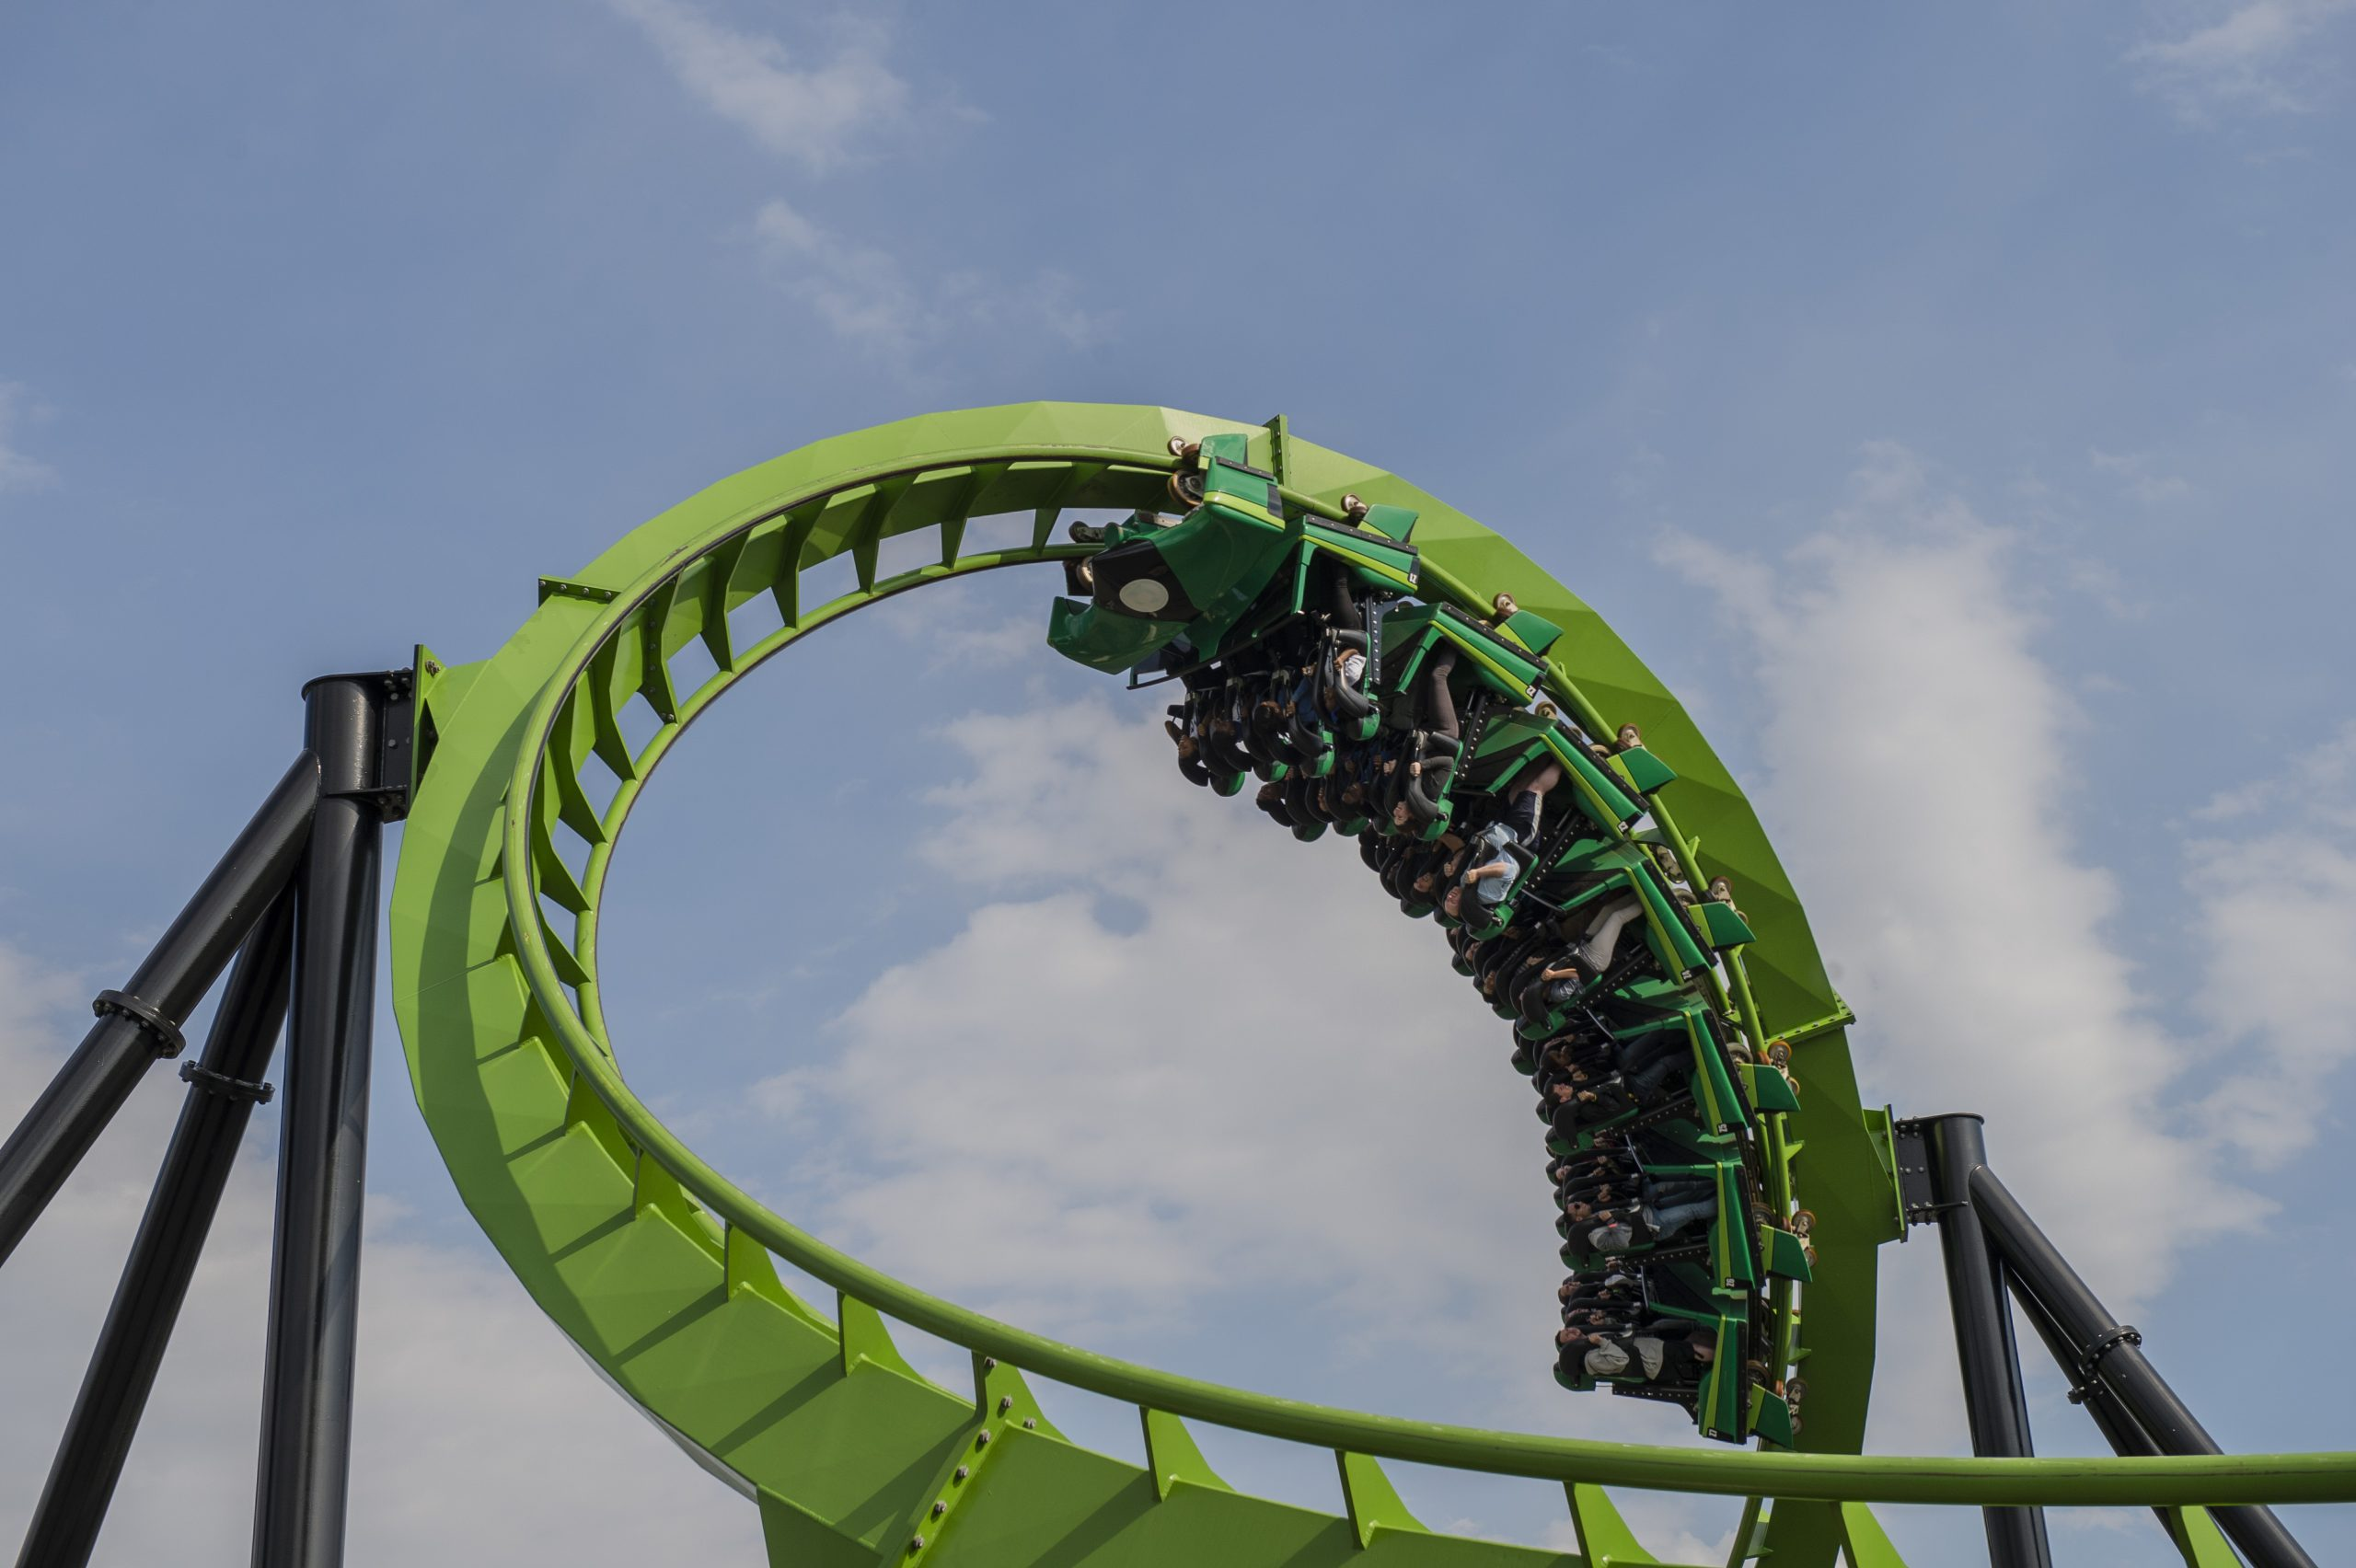 Green_lantern_1_0-scaled